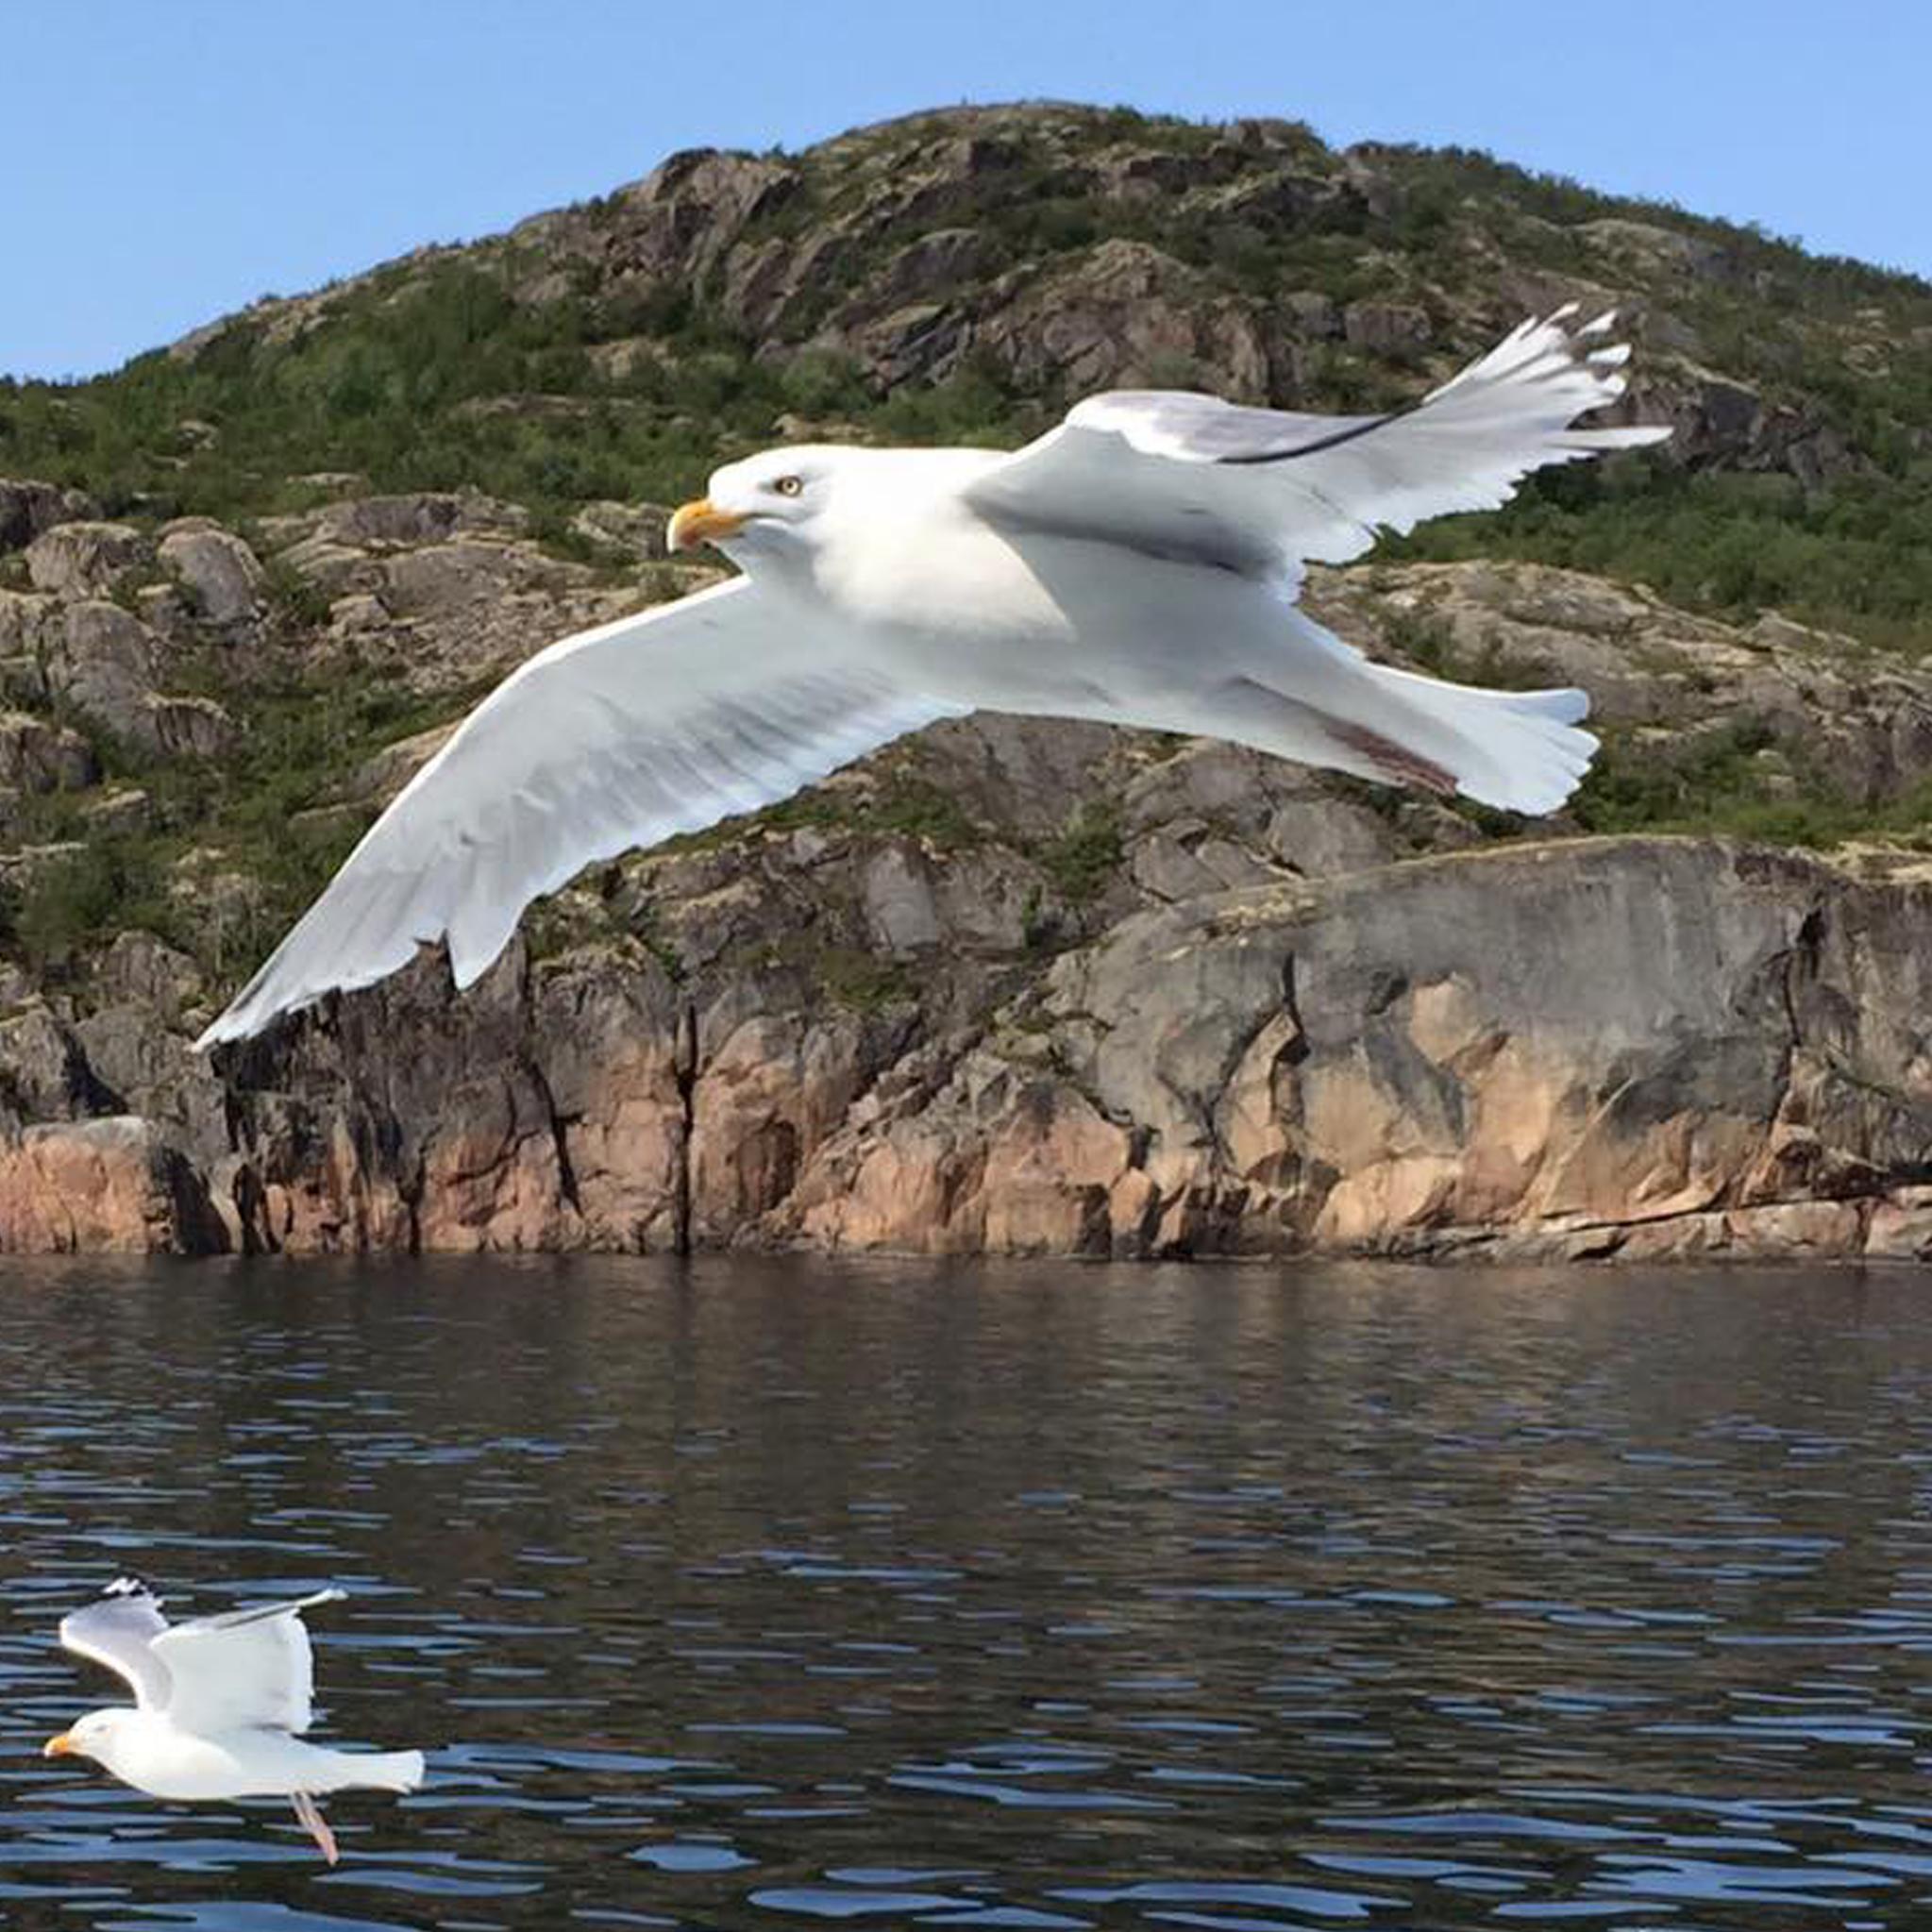 flyg fri som fågeln